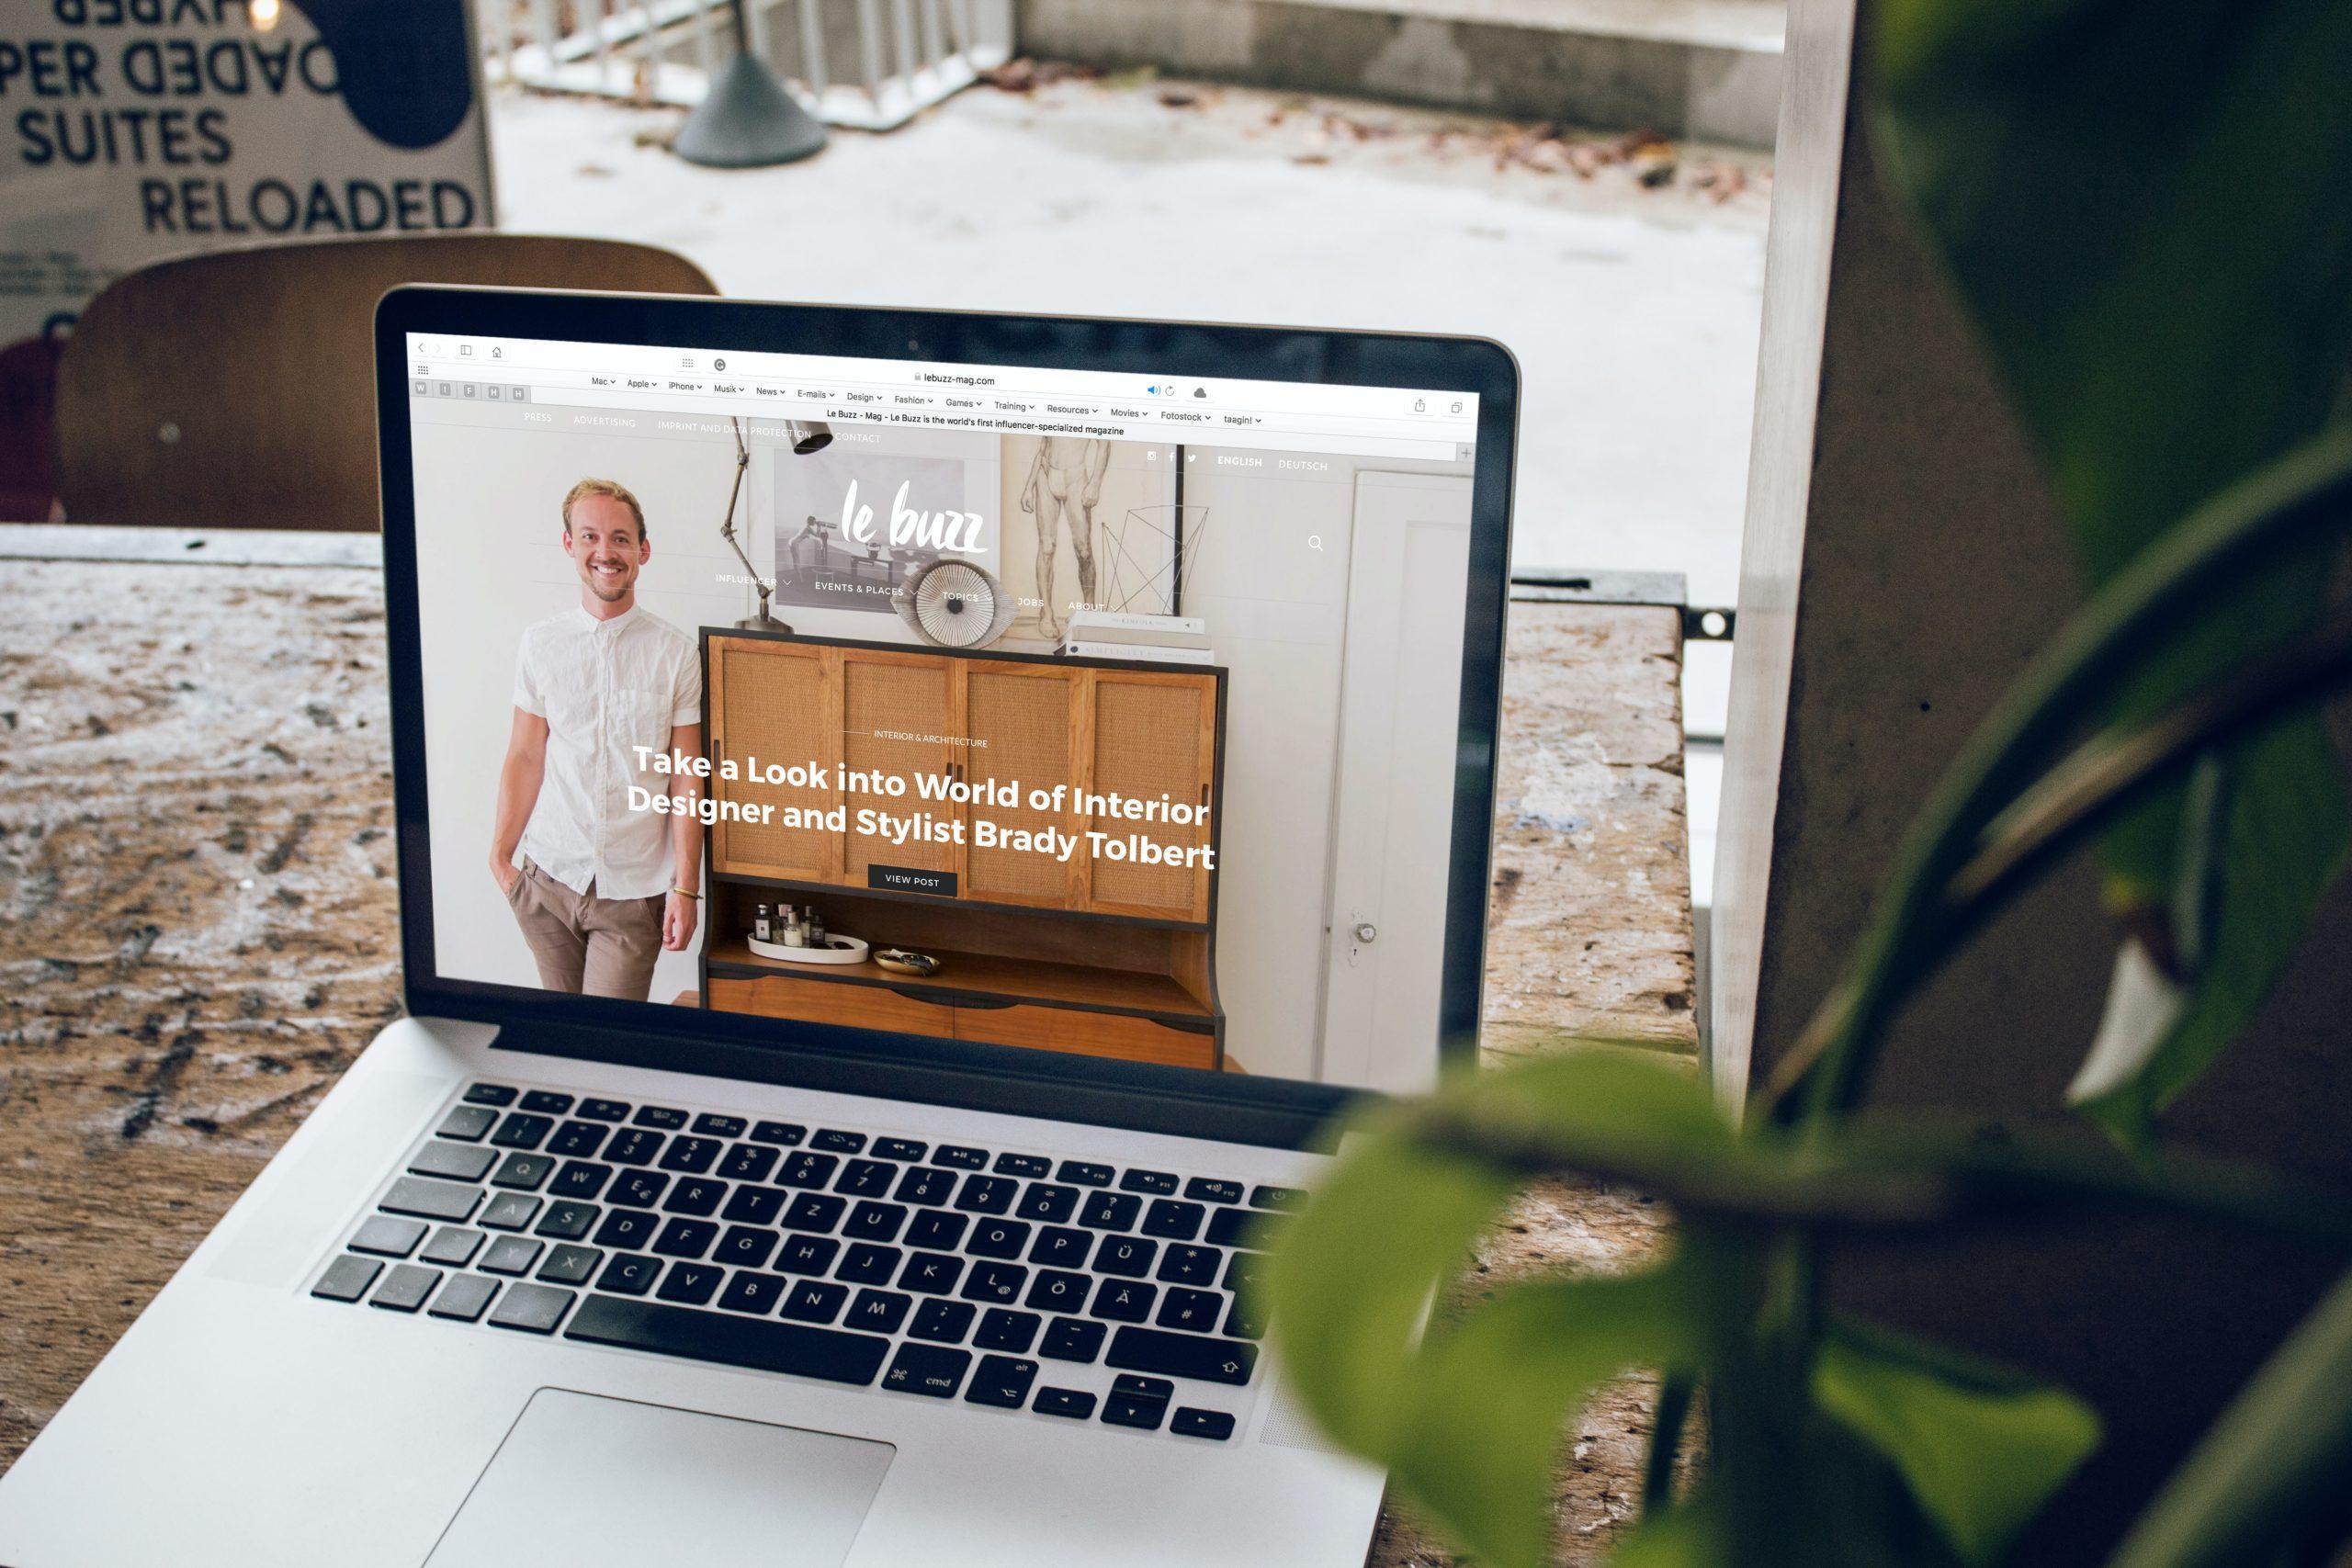 macbook pro on top of brown wooden table